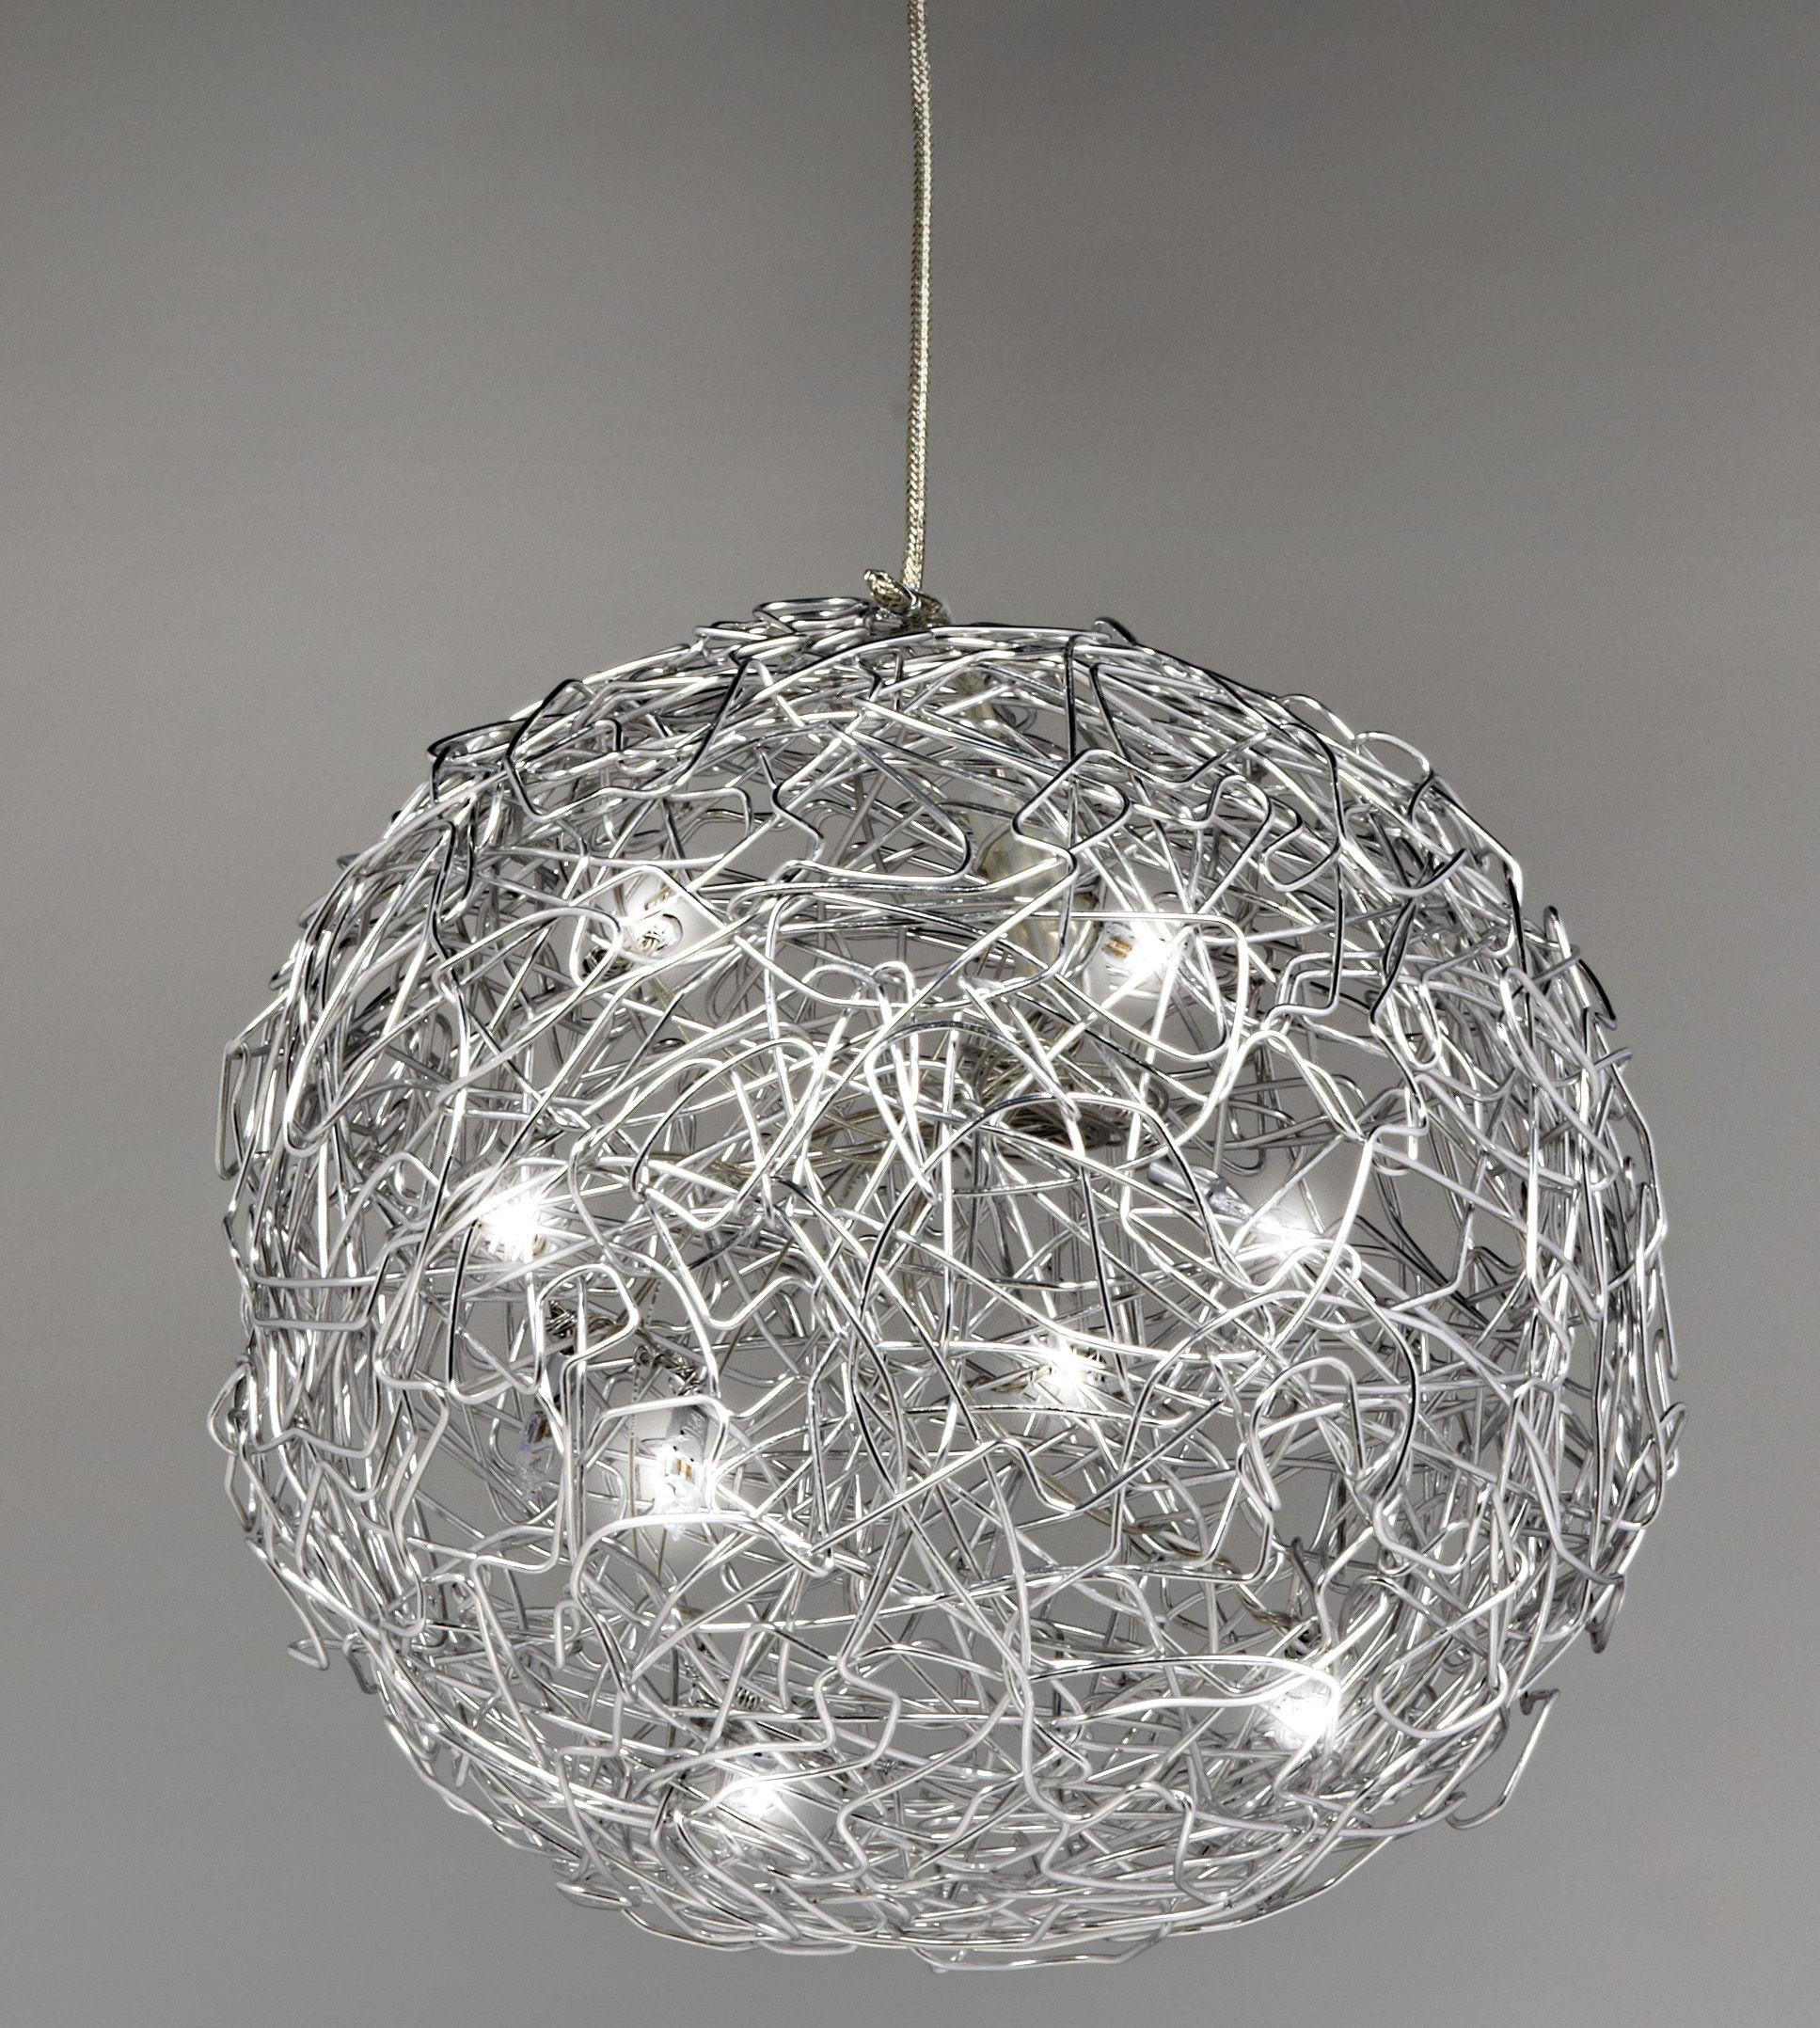 fil de fer pendant 30 cm aluminium 30 cm by. Black Bedroom Furniture Sets. Home Design Ideas